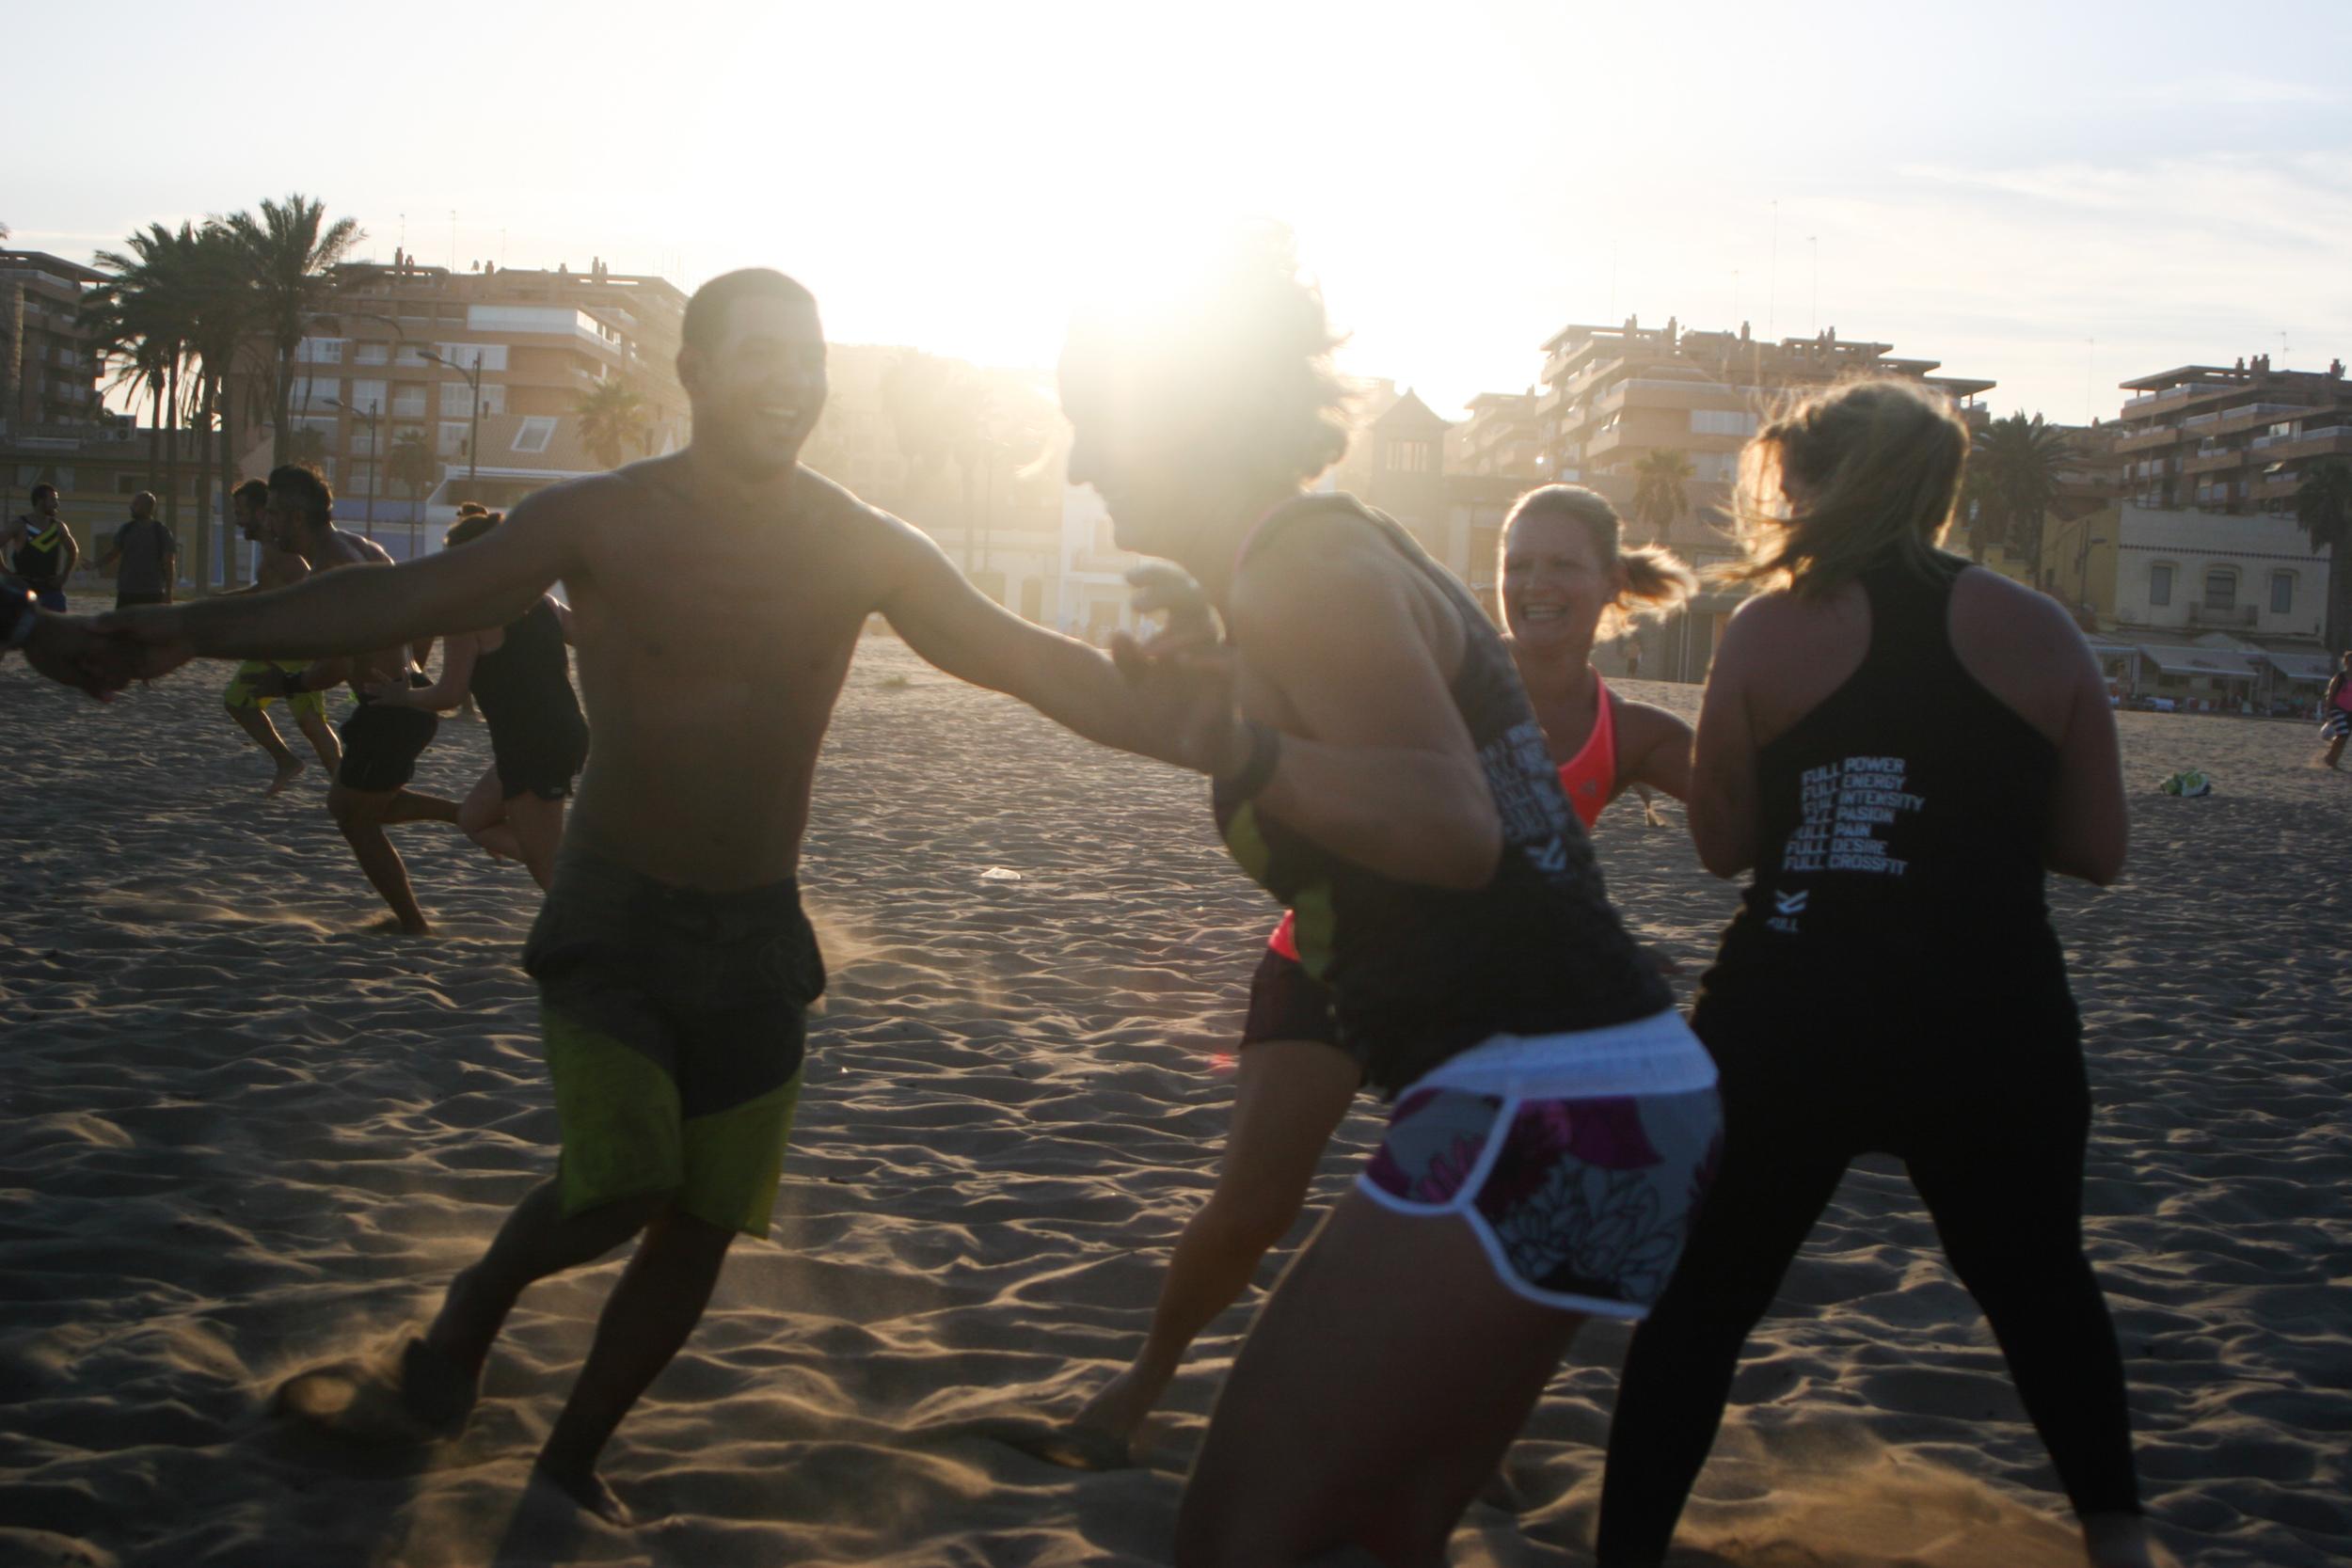 Full_CrossFit_Beach_Wod_V2_2015-25.jpg